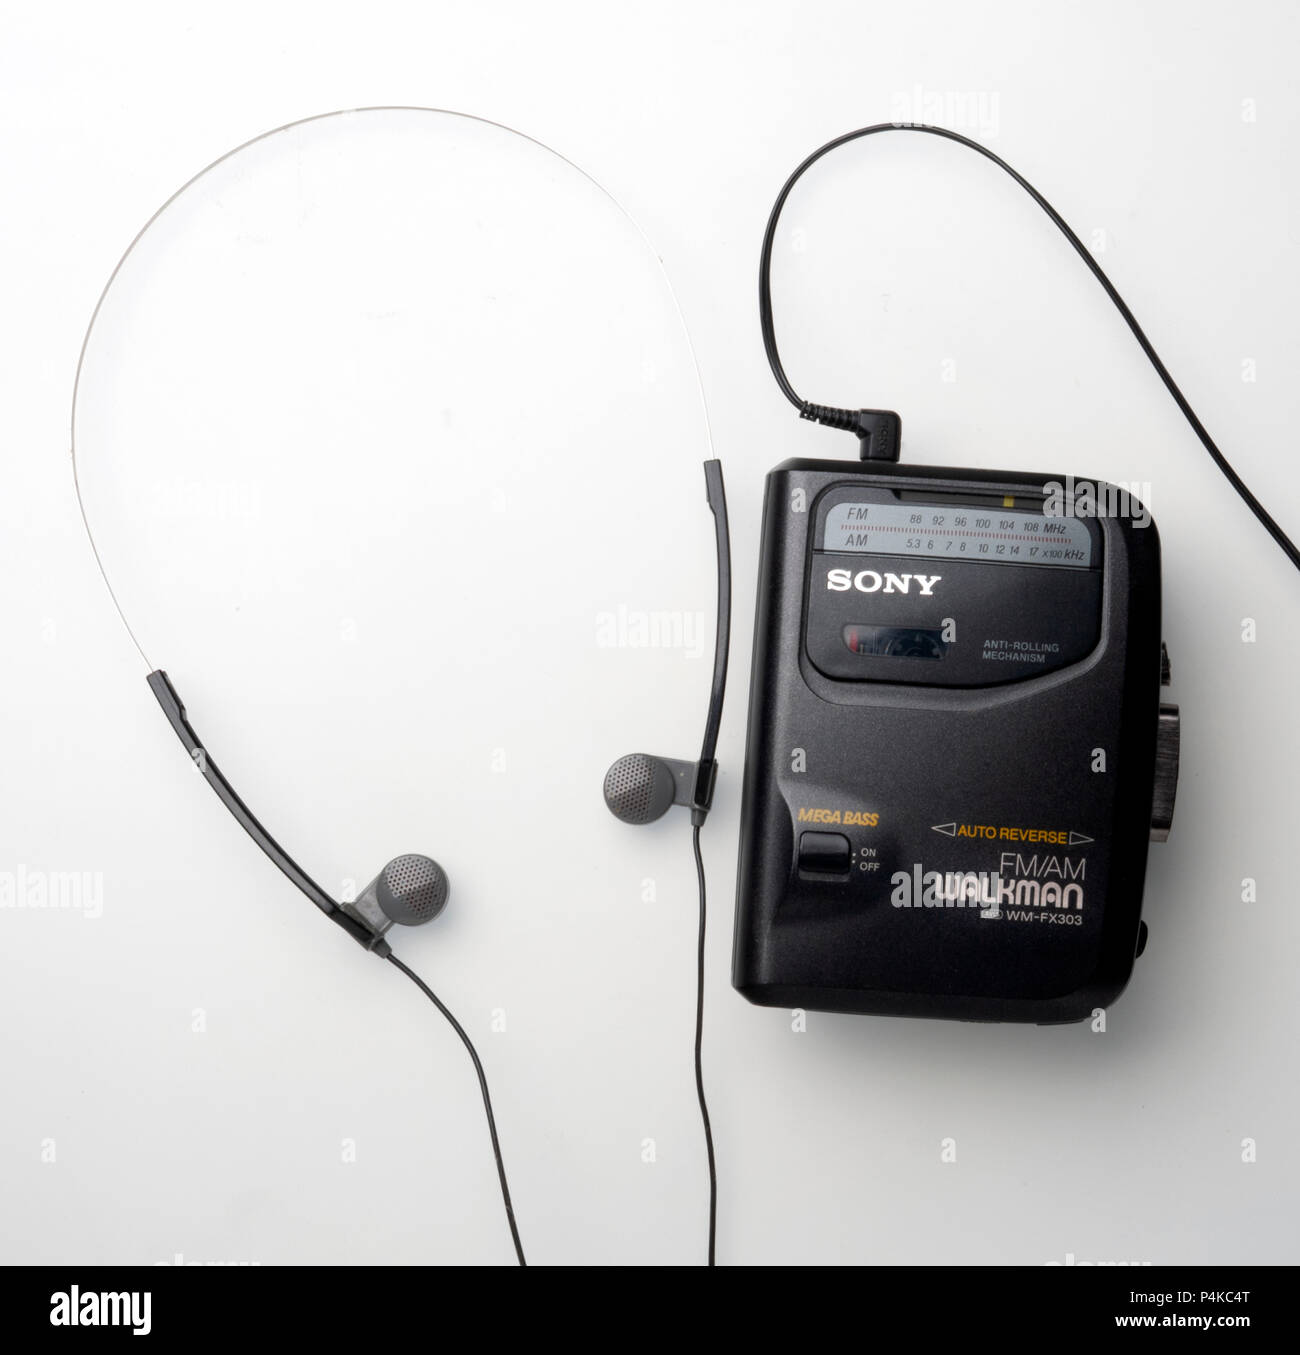 Sony Cassette AM-FM radio Walkman - Stock Image